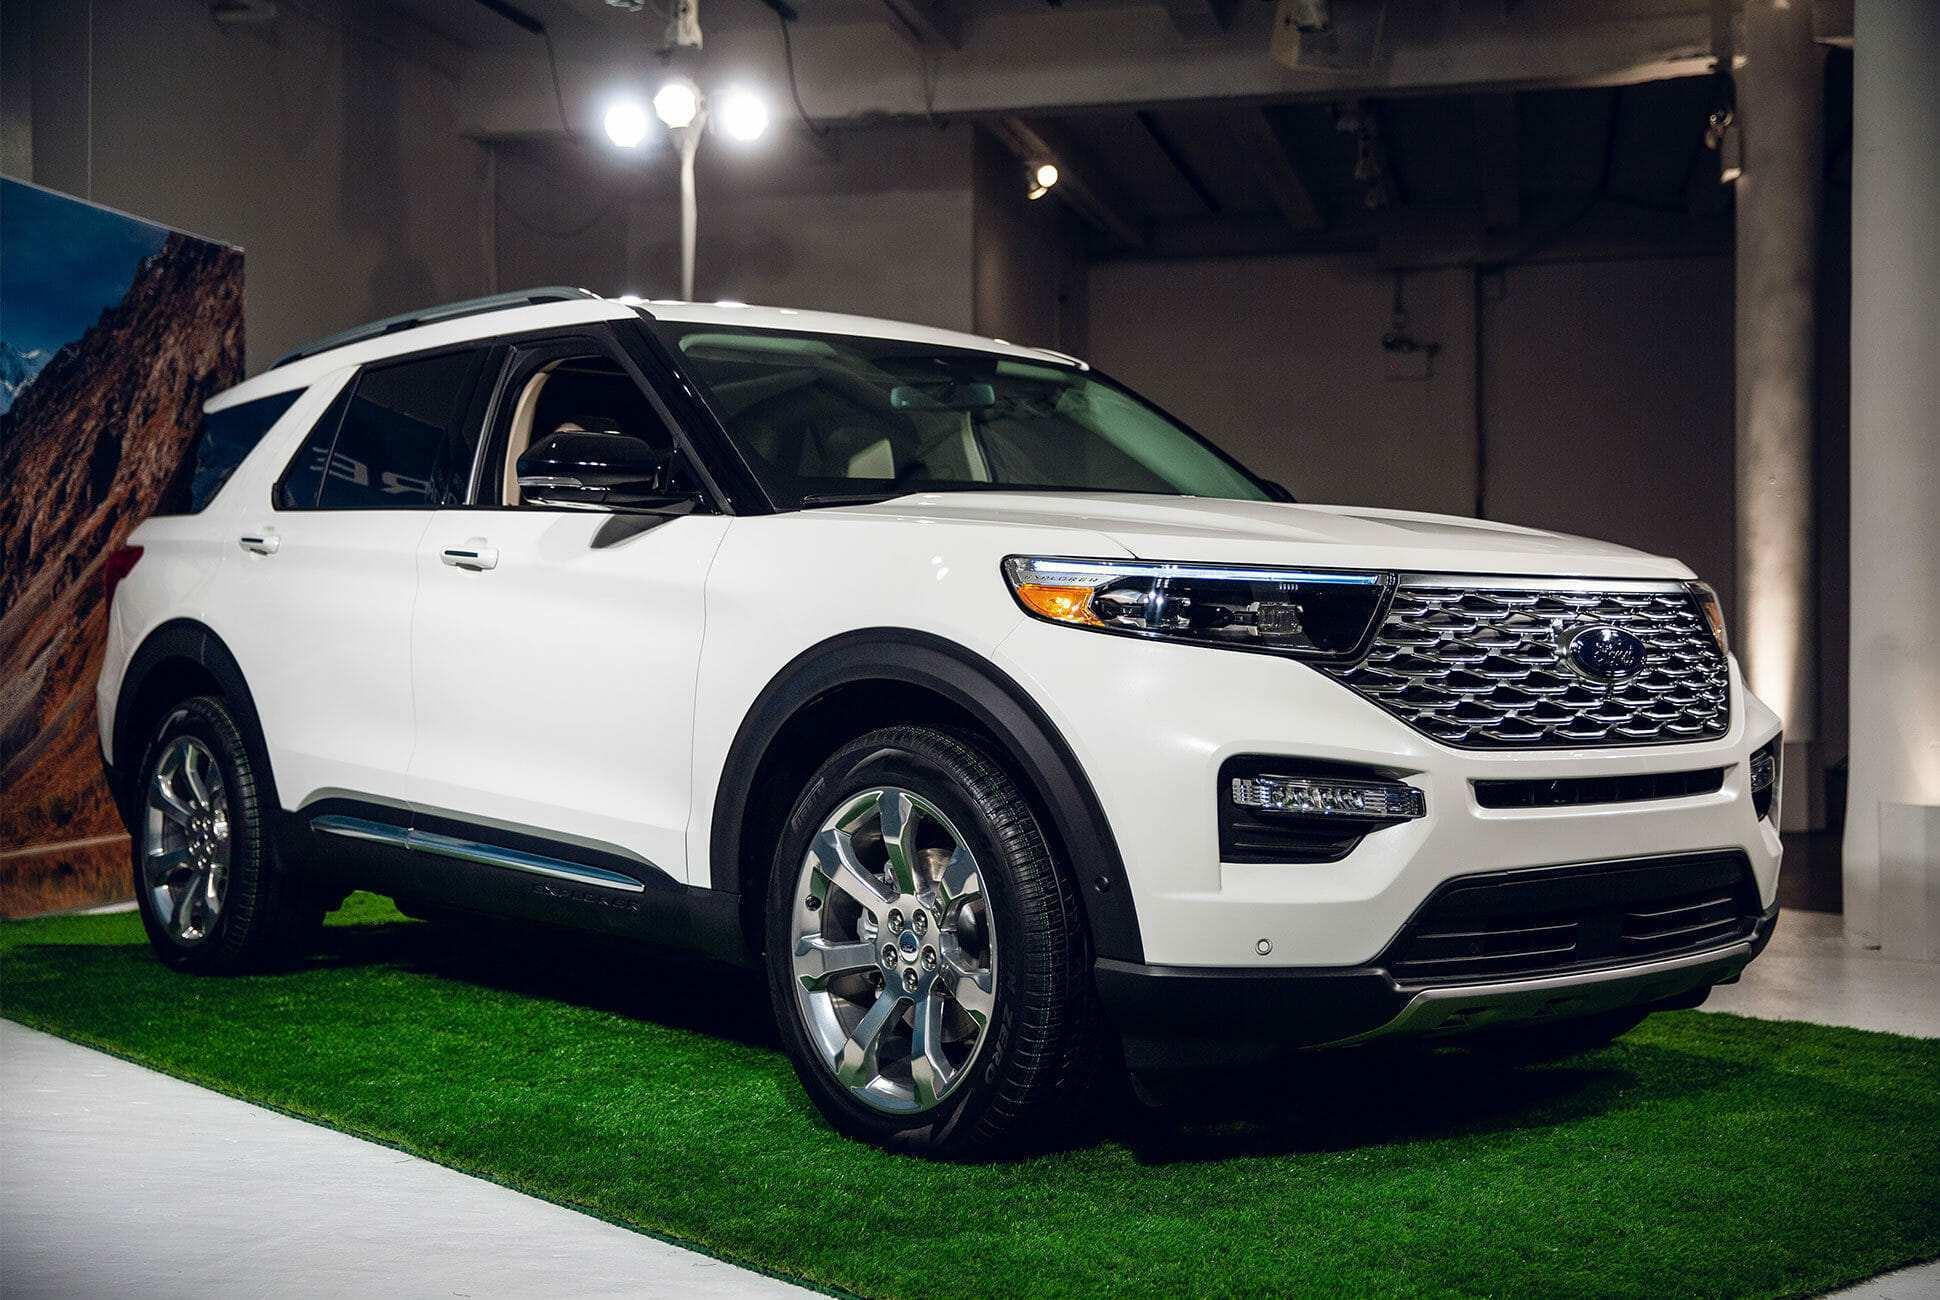 16 New 2020 Ford Explorer Design Research New for 2020 Ford Explorer Design